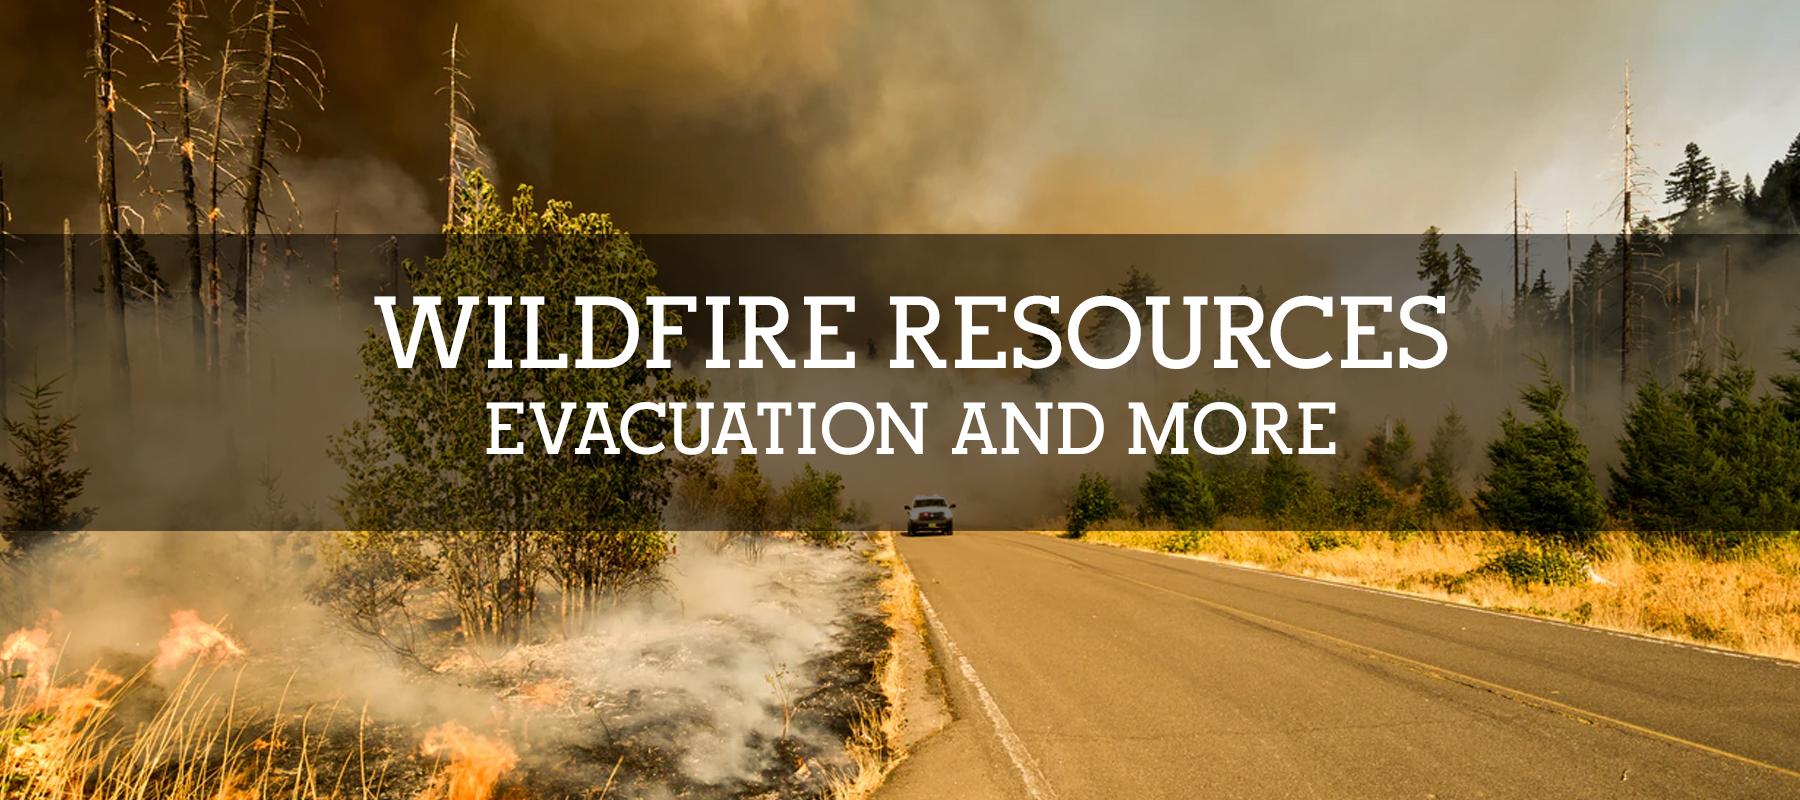 COLORADOR WILDFIRE RESOURCES - EVACUATION AND MORE